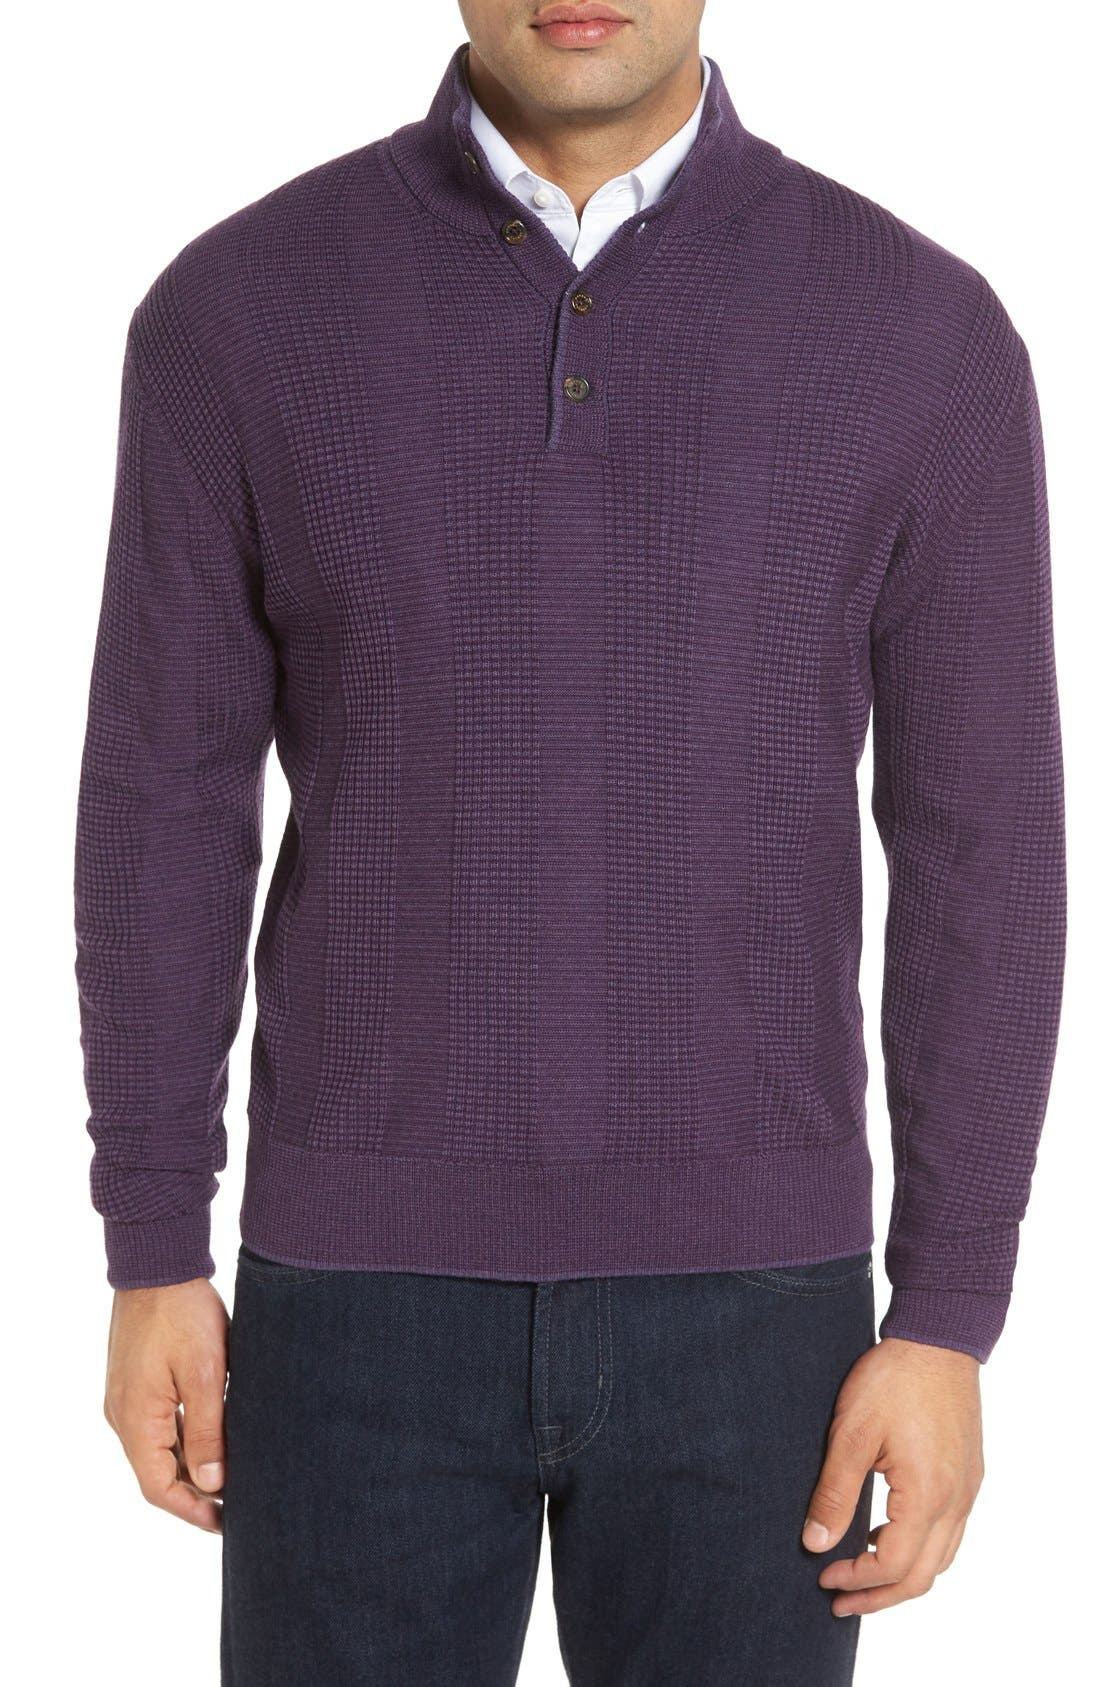 ROBERT TALBOTT Legacy Collection Mock Neck Wool Sweater